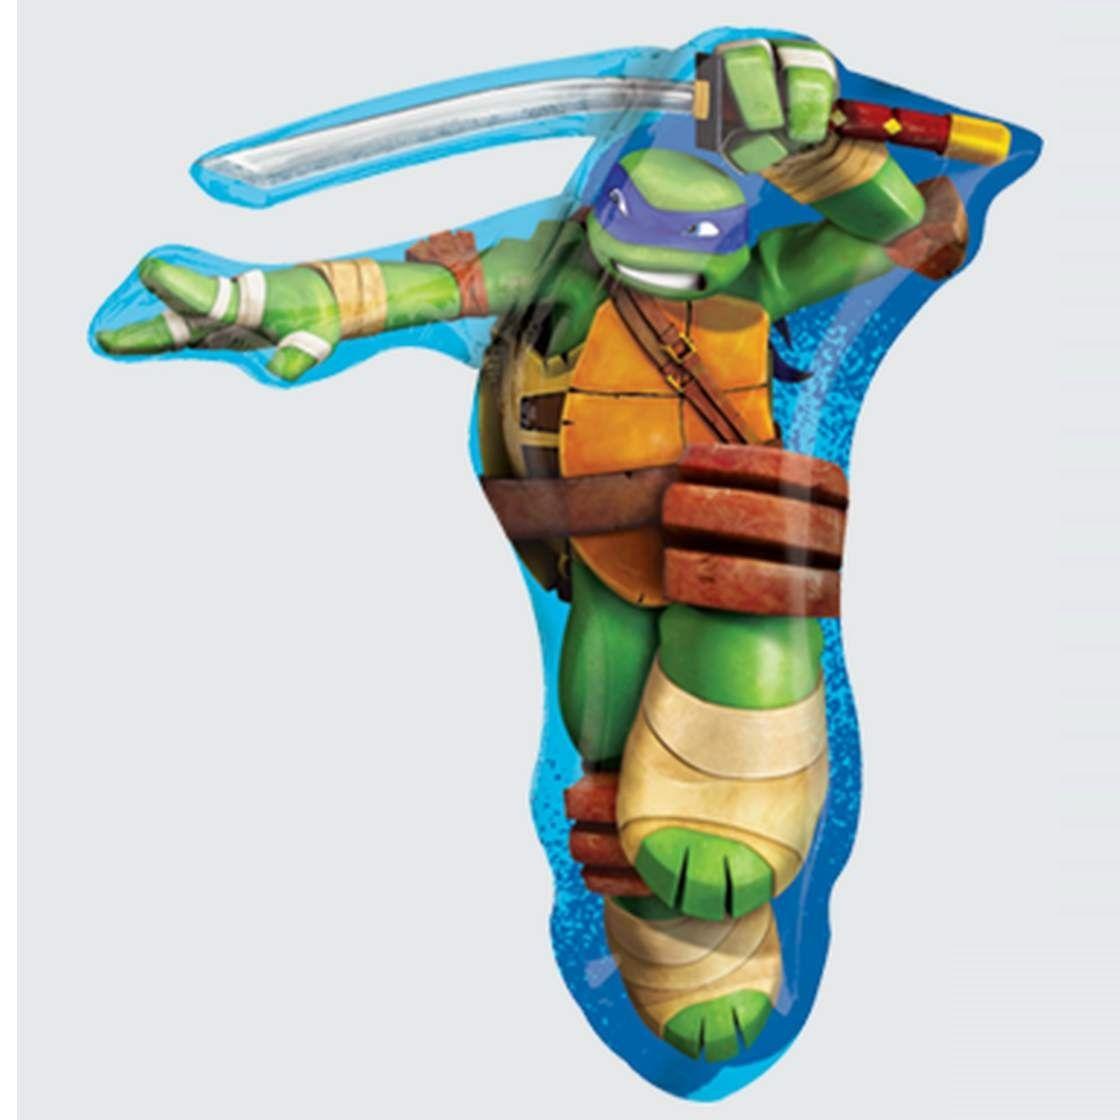 Ninja Turtles Nindža Kornjača balon folija